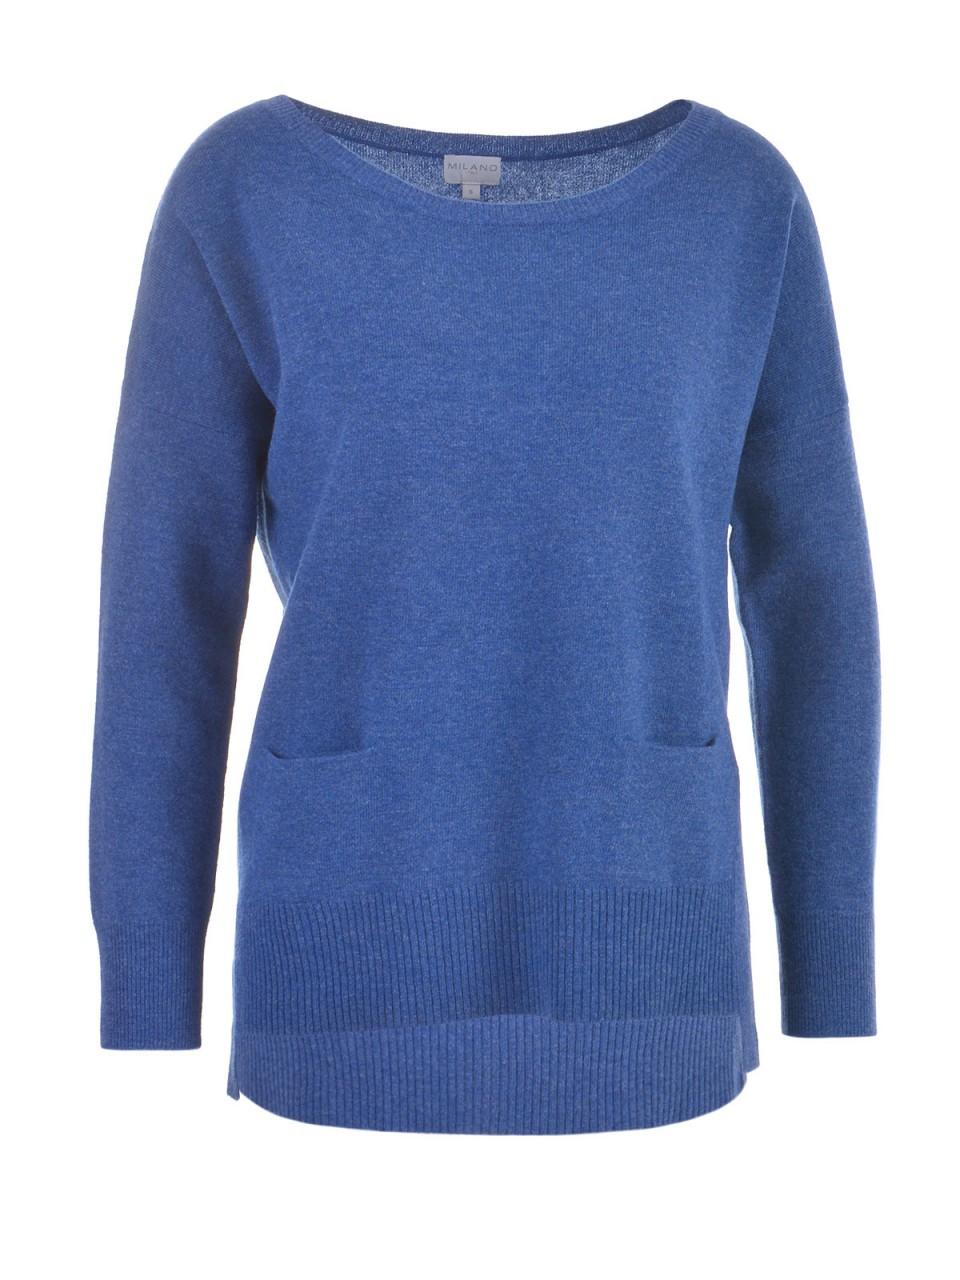 milano-italy-damen-pullover-dunkelblau